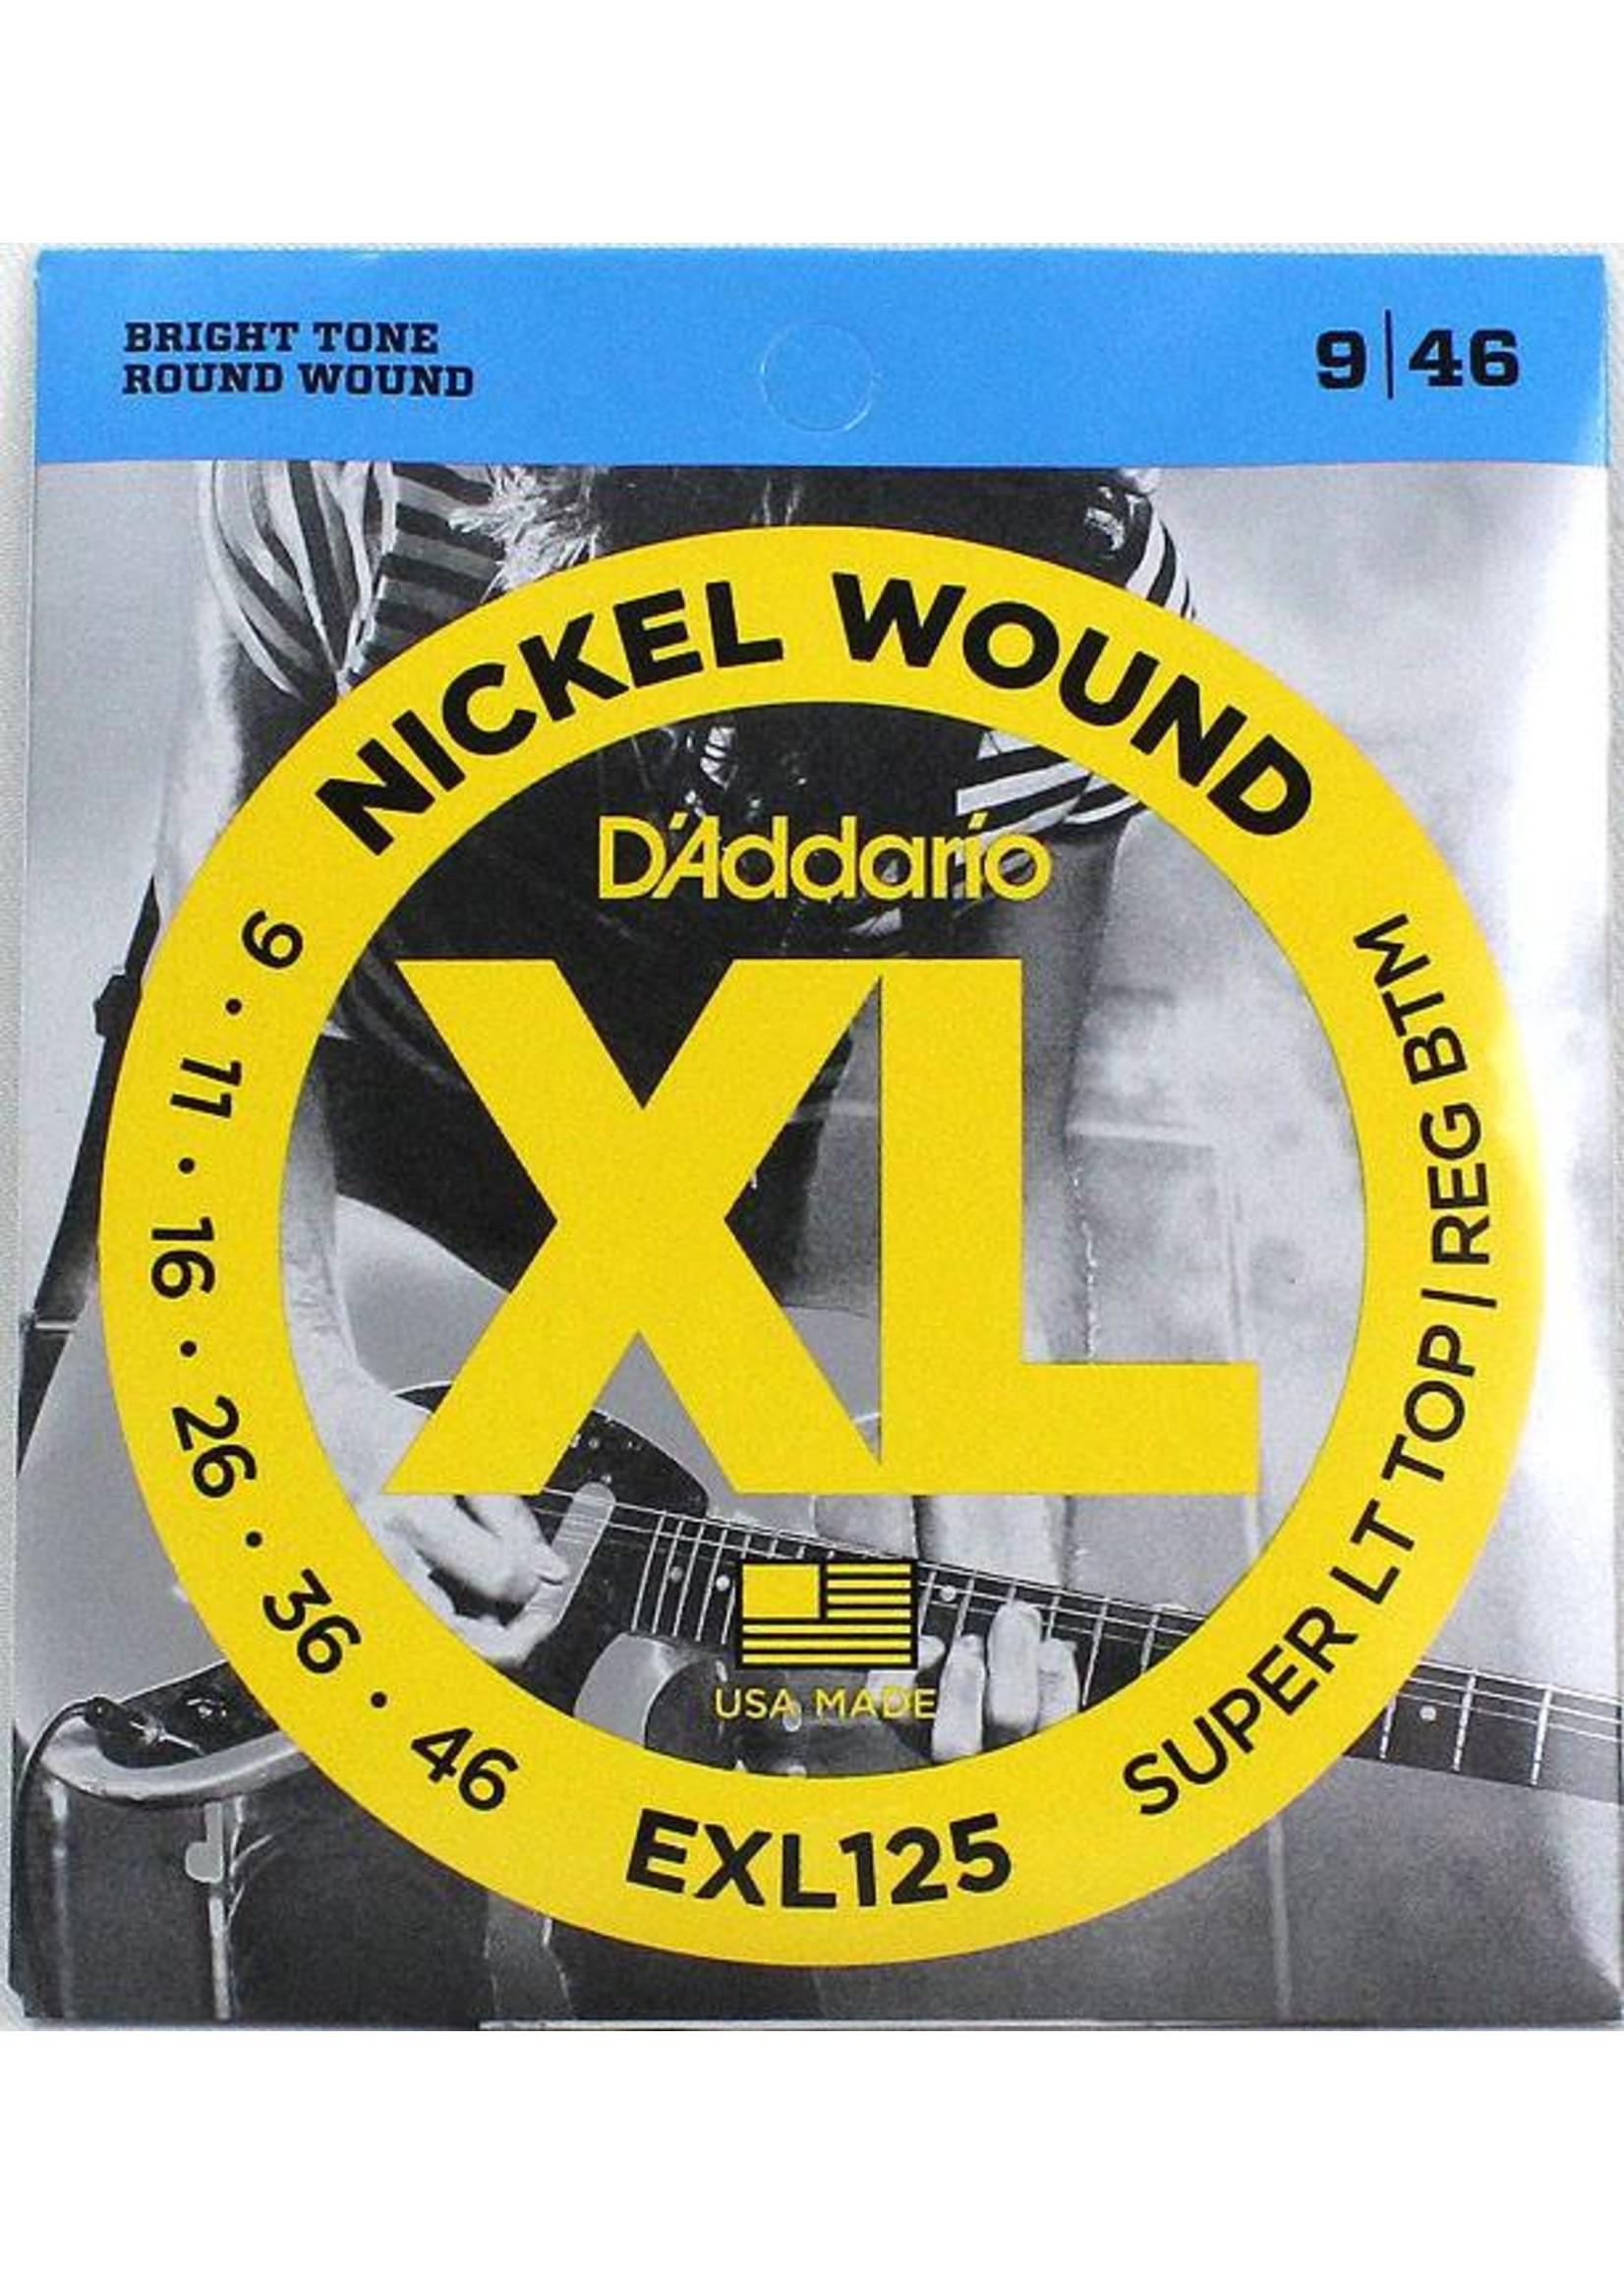 D'ADDARIO EXL125 D'ADDARIO